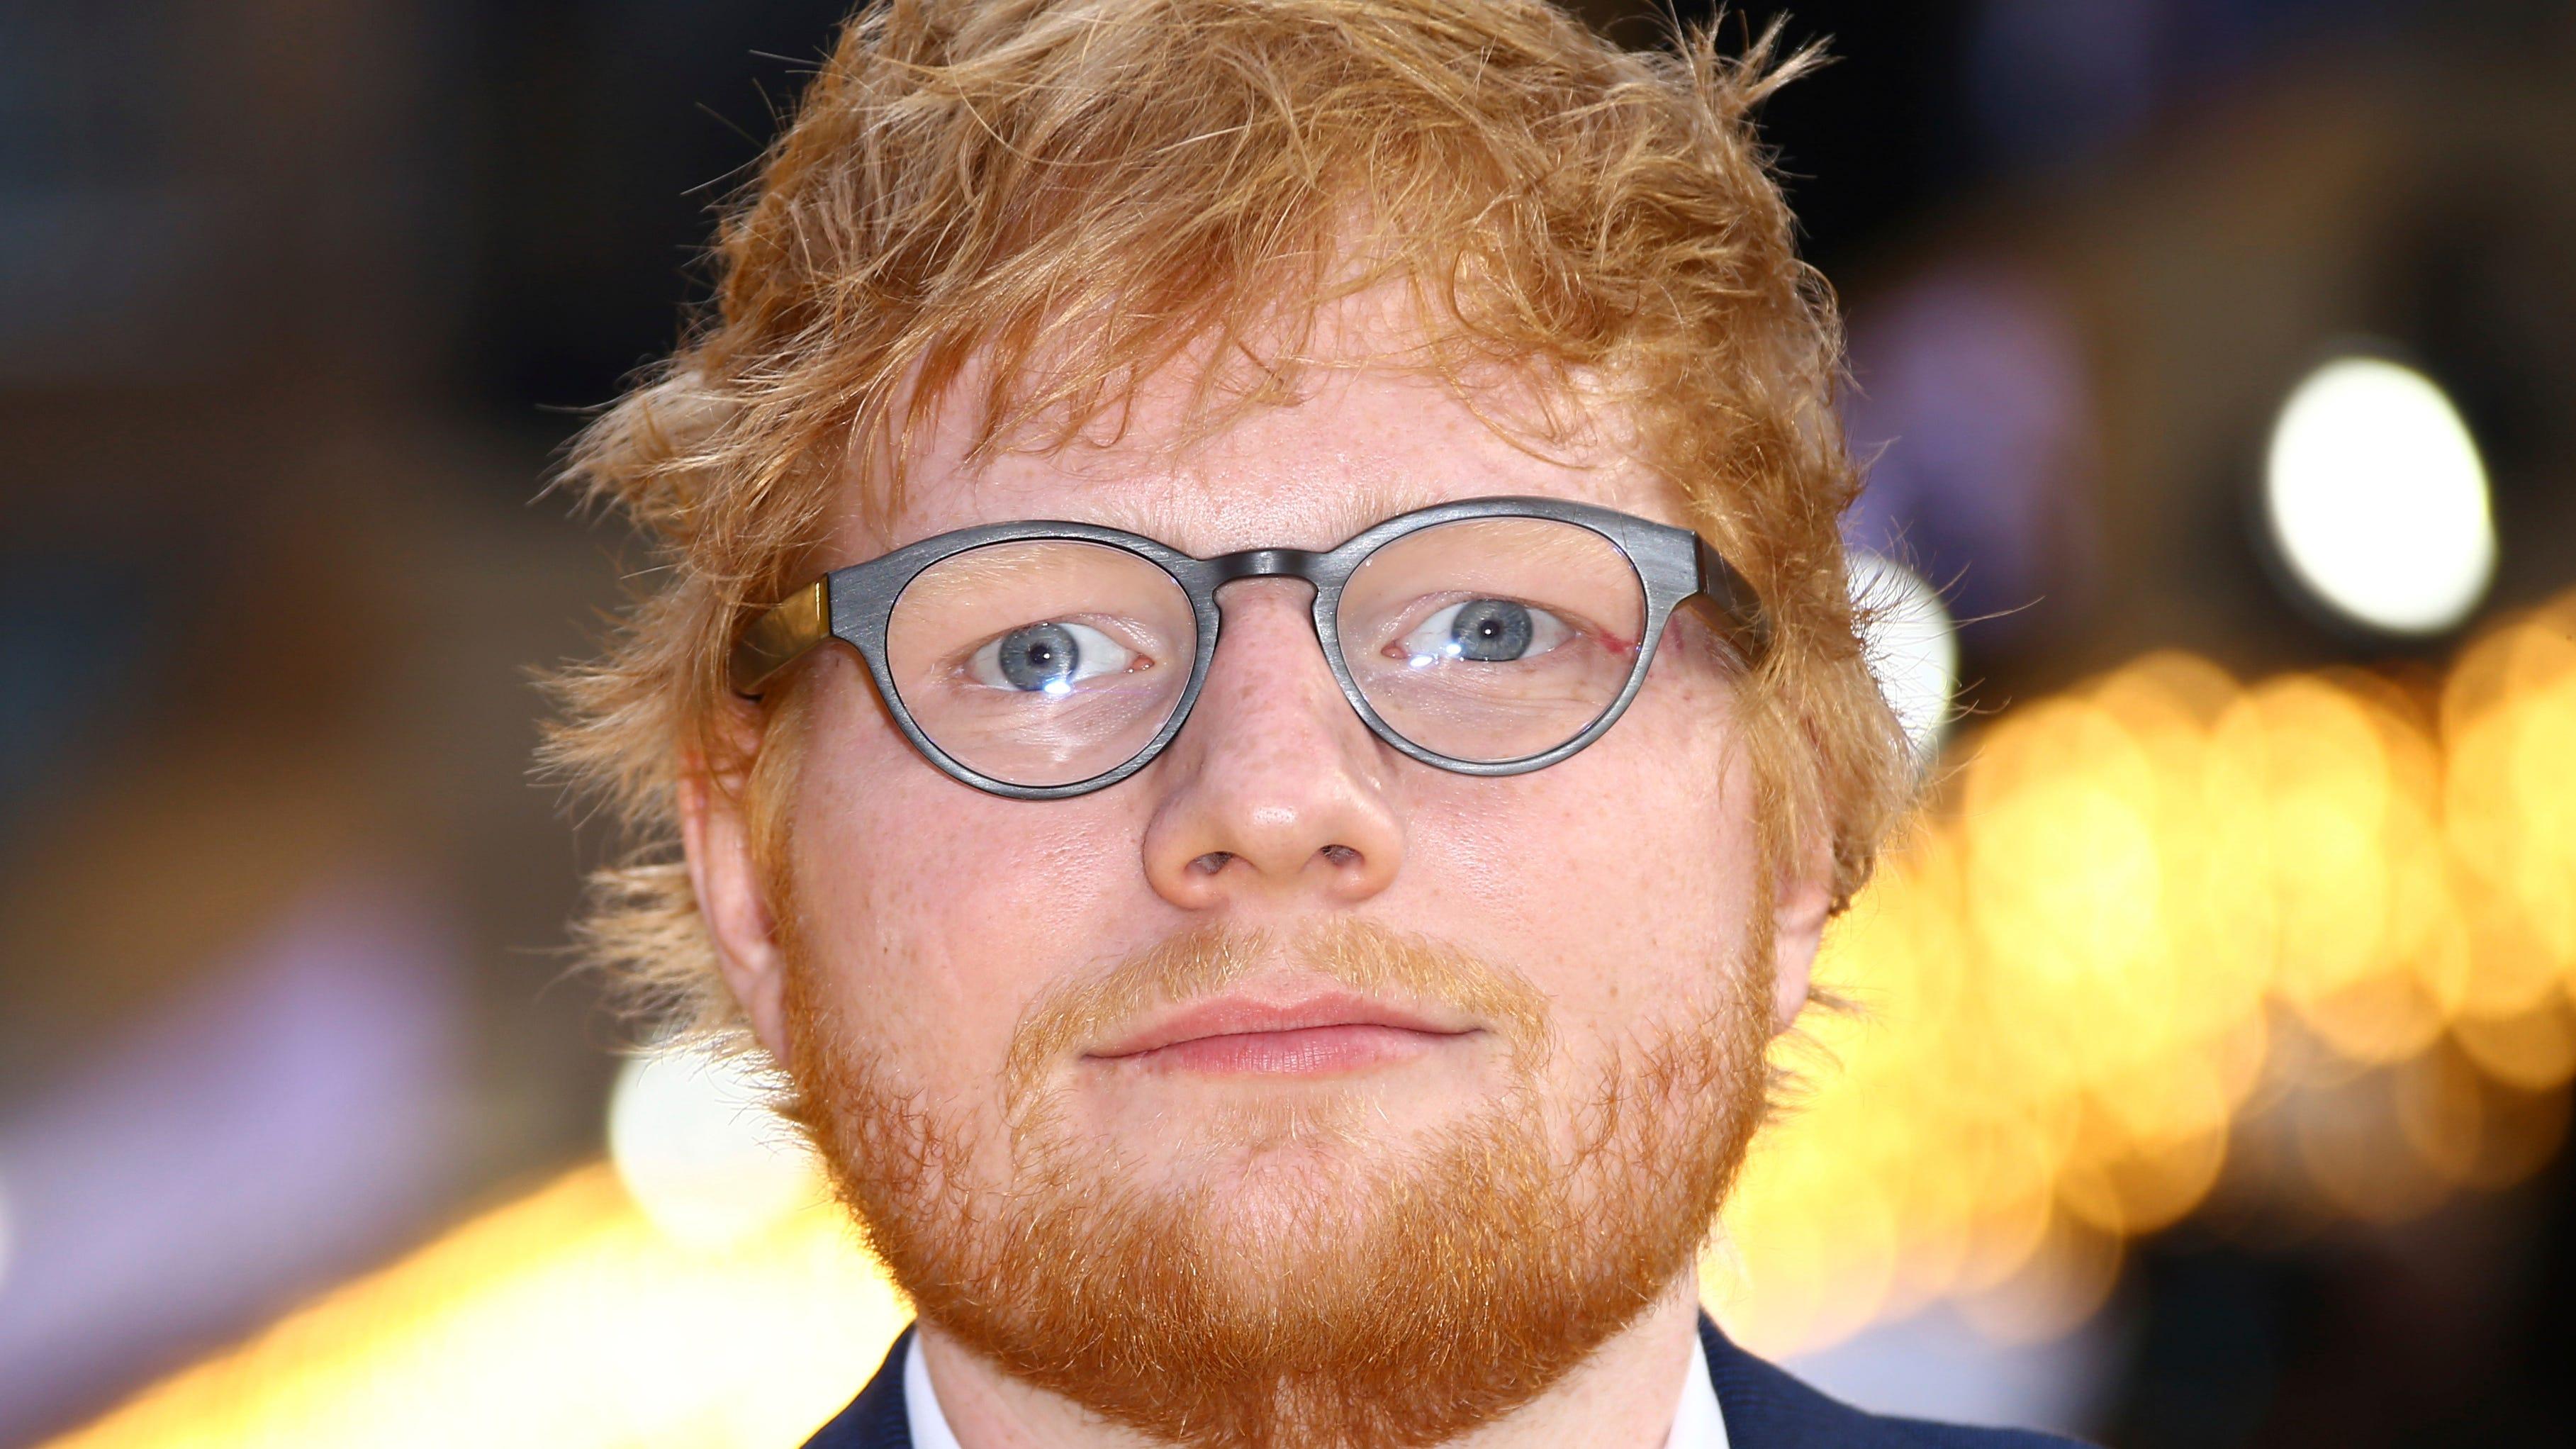 Pop star Ed Sheeran has COVID, will do performances from home